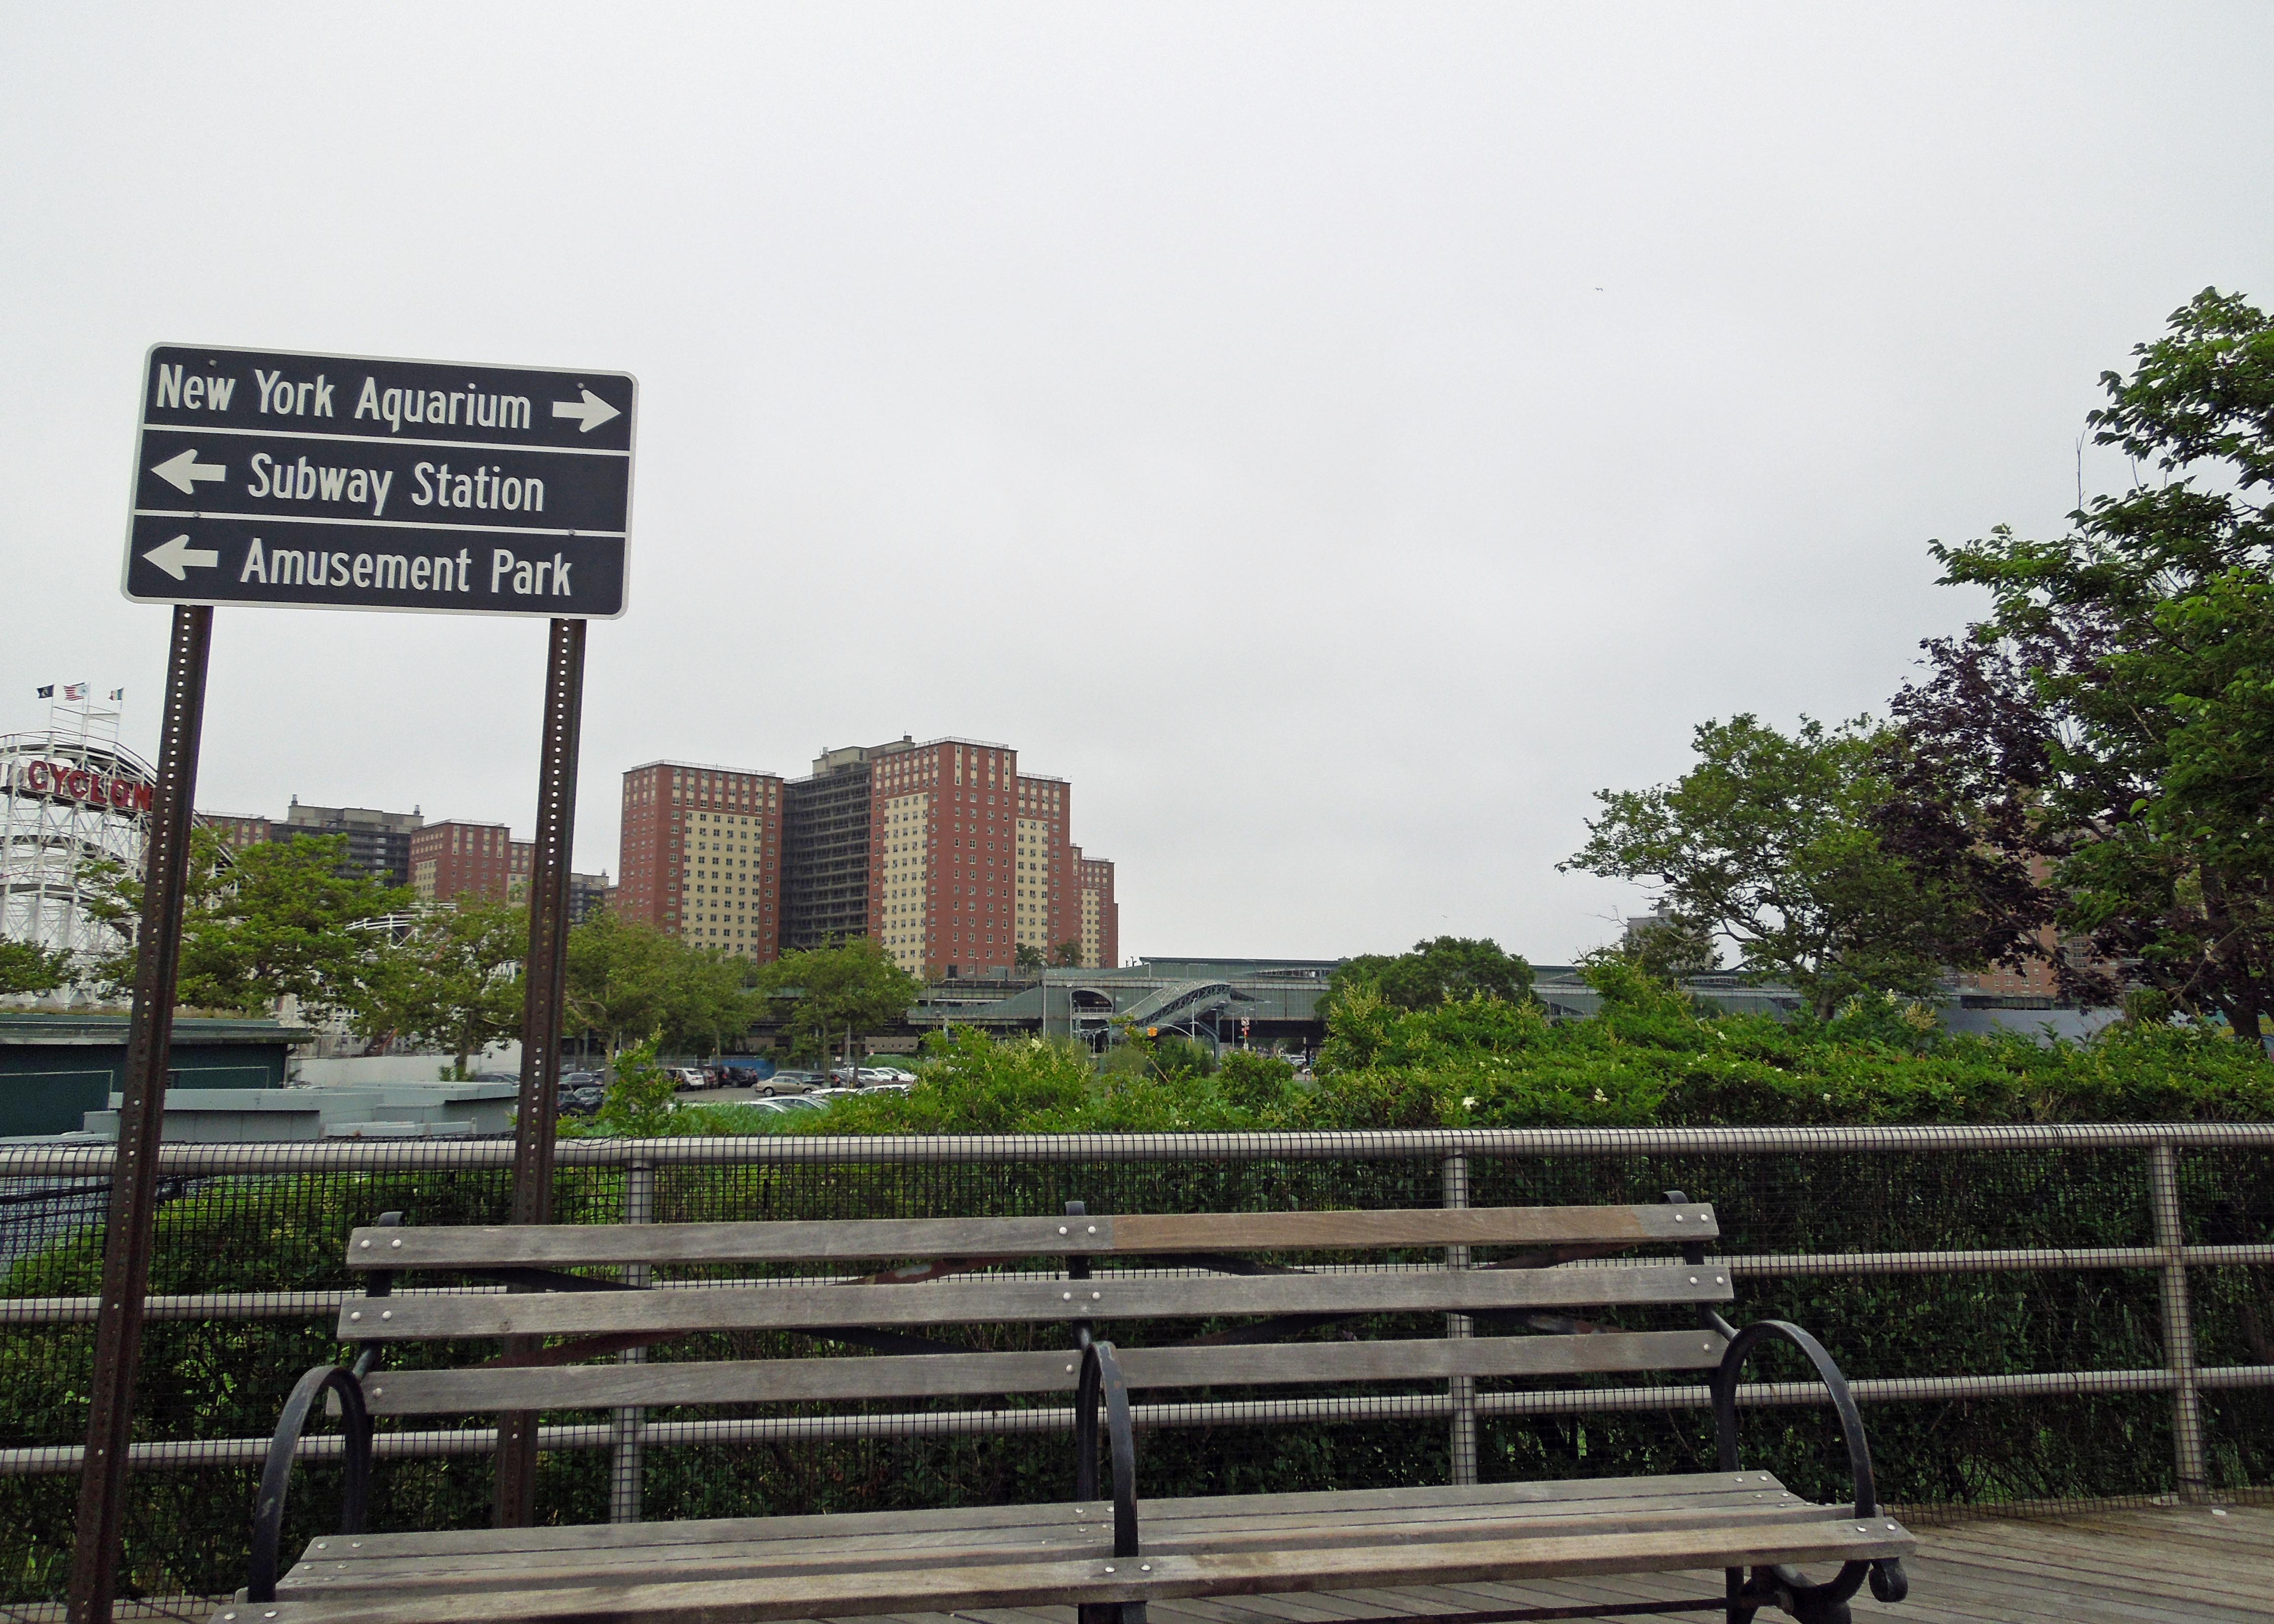 NYC_COLT_3_5279_edit_resize